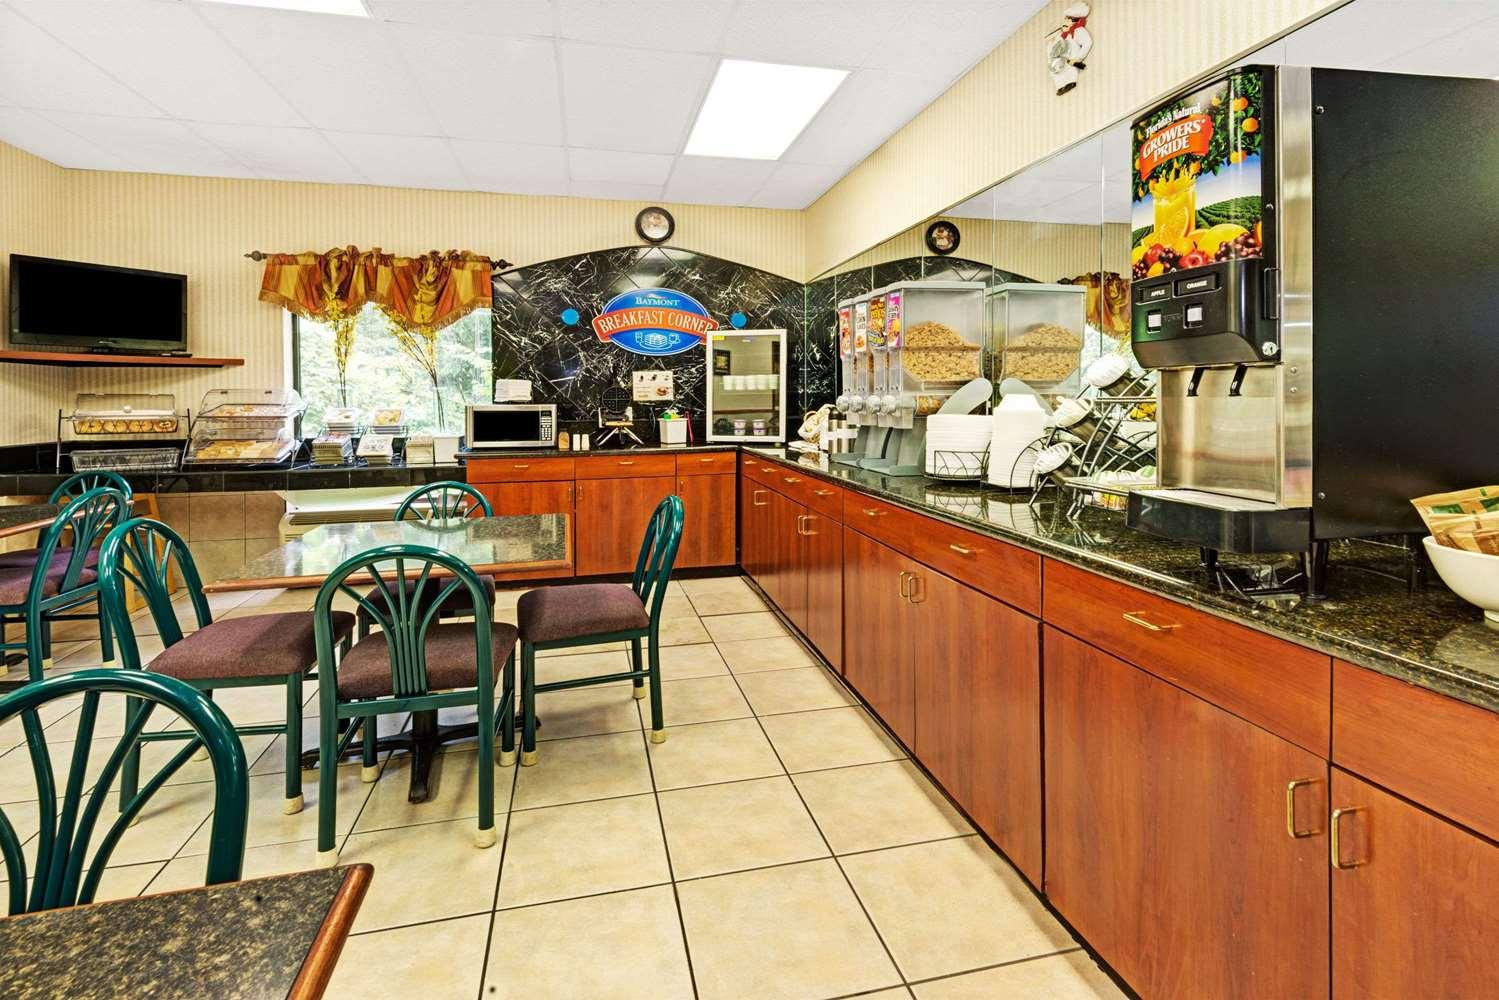 proam - Baymont Inn & Suites Lawrence